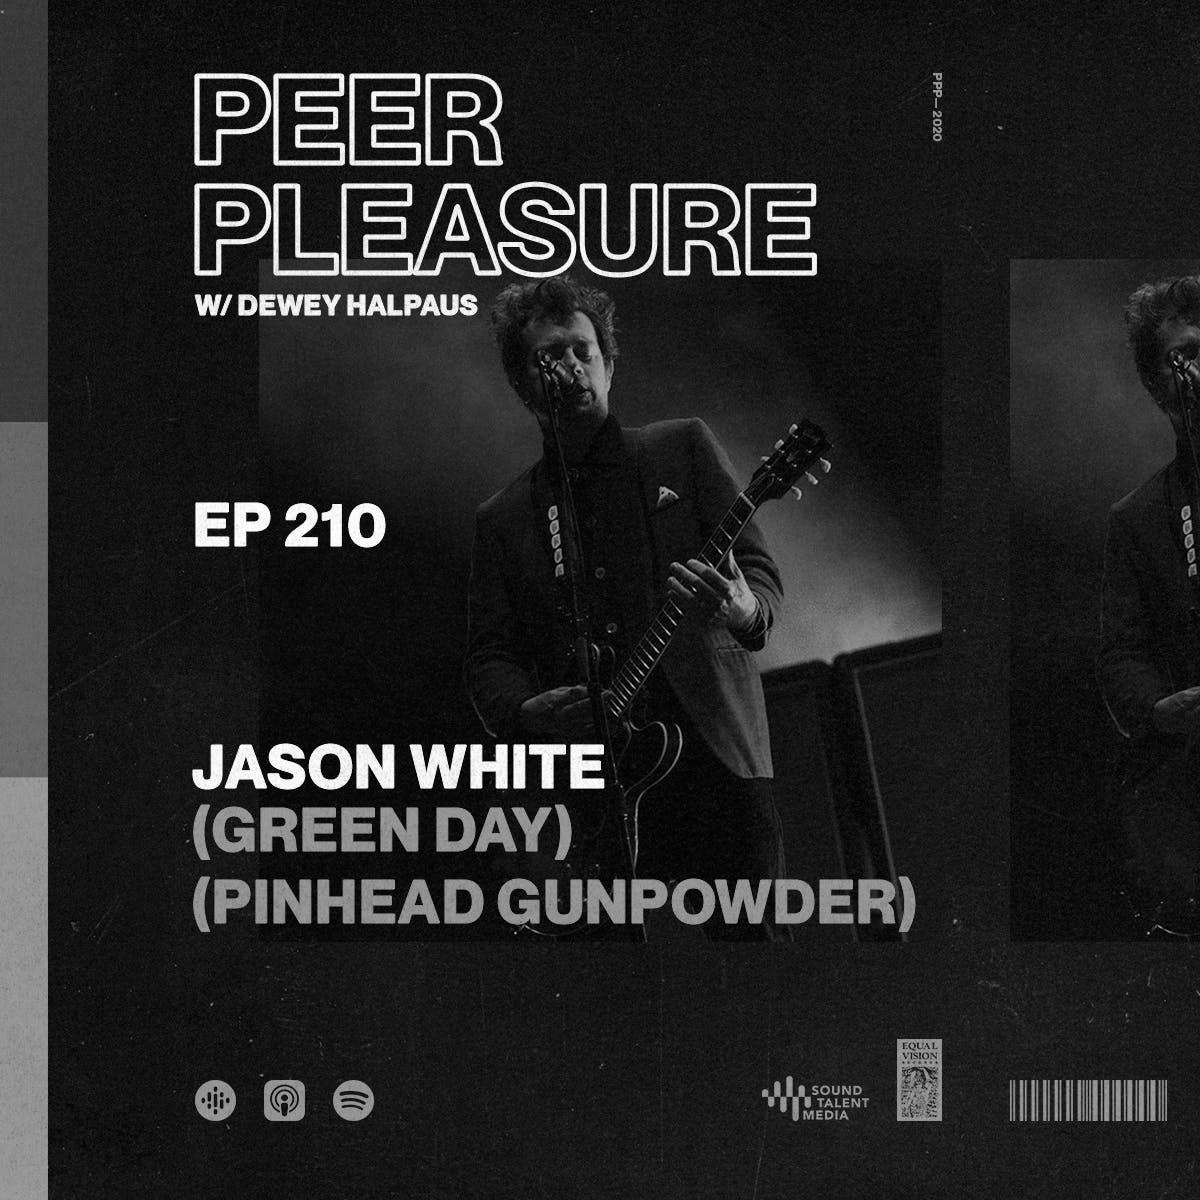 Jason White (Green Day/Pinhead Gunpowder)